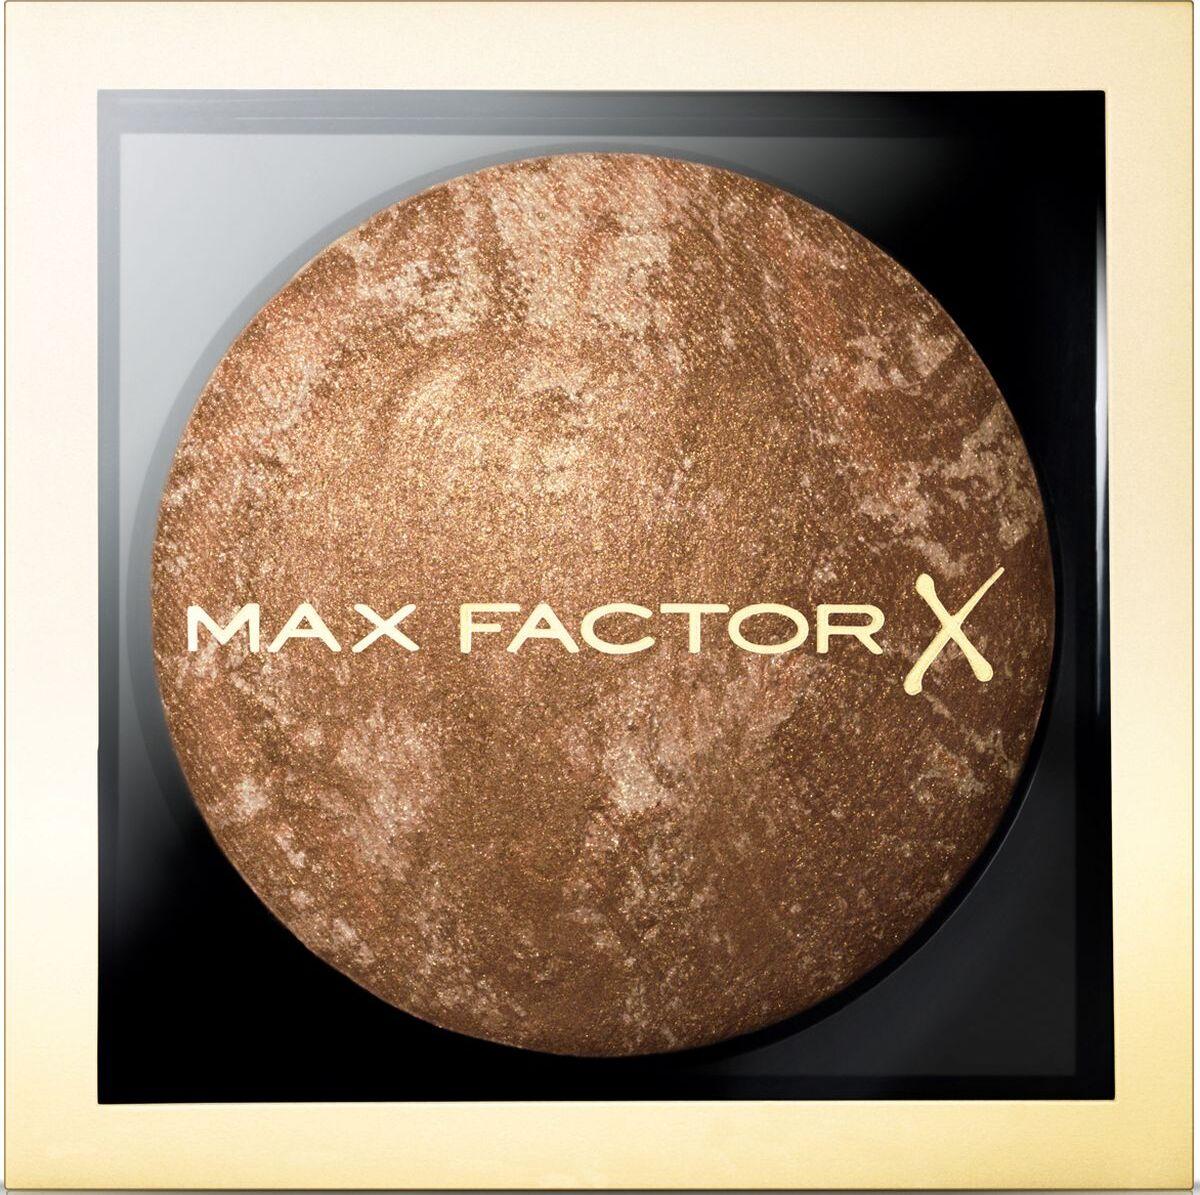 Пудра Max Factor Бронзер Light, тон №5